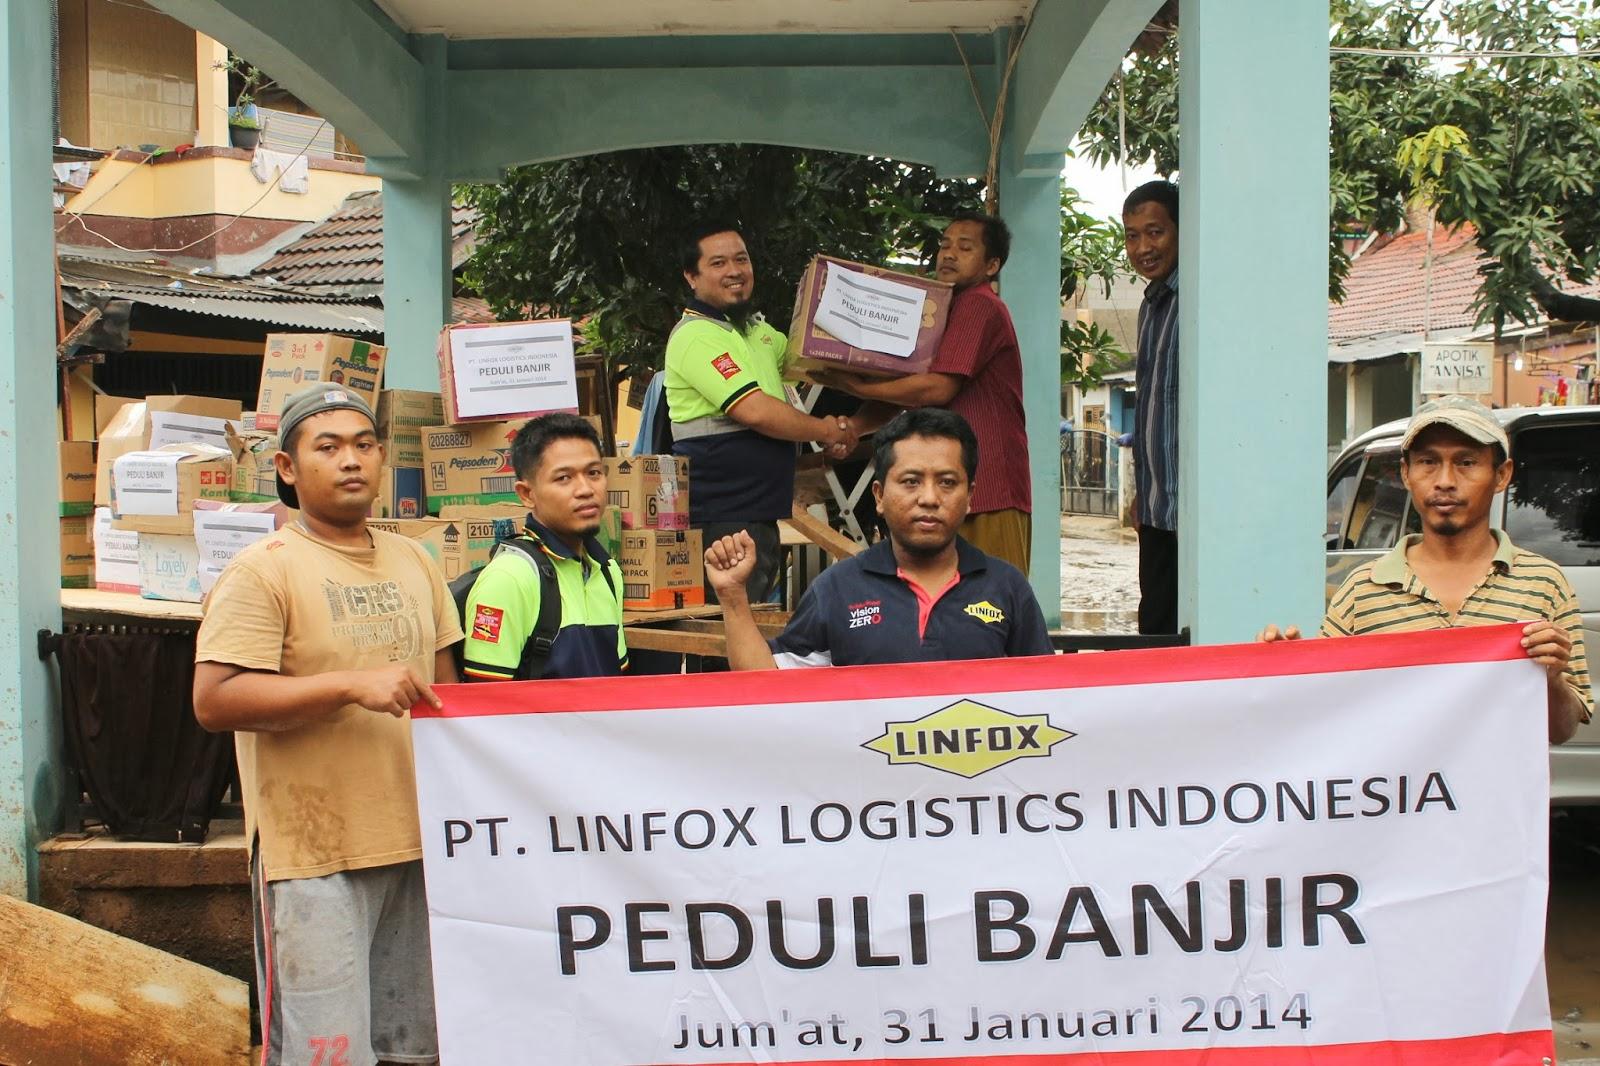 serikat pekerja linfox peduli banjir